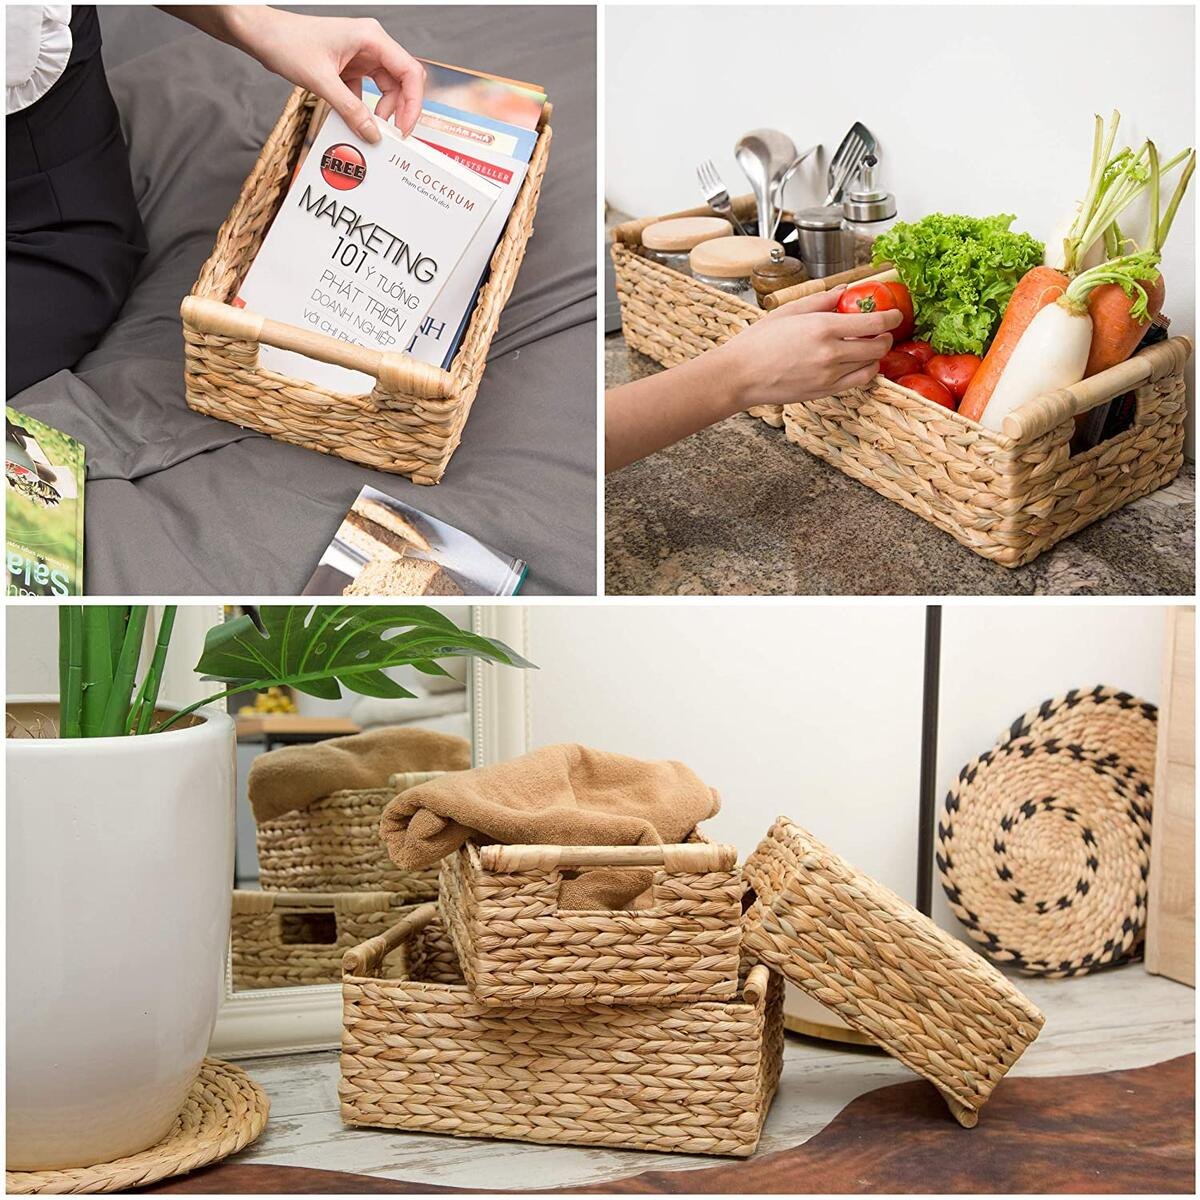 Wicker Baskets for Storage Organizing, Water Hyacinth Storage Baskets Rectangular with Wooden Handles for Shelves, Natural Wicker Storage Basket Bins - Set of Wicker Baskets for Home Organization